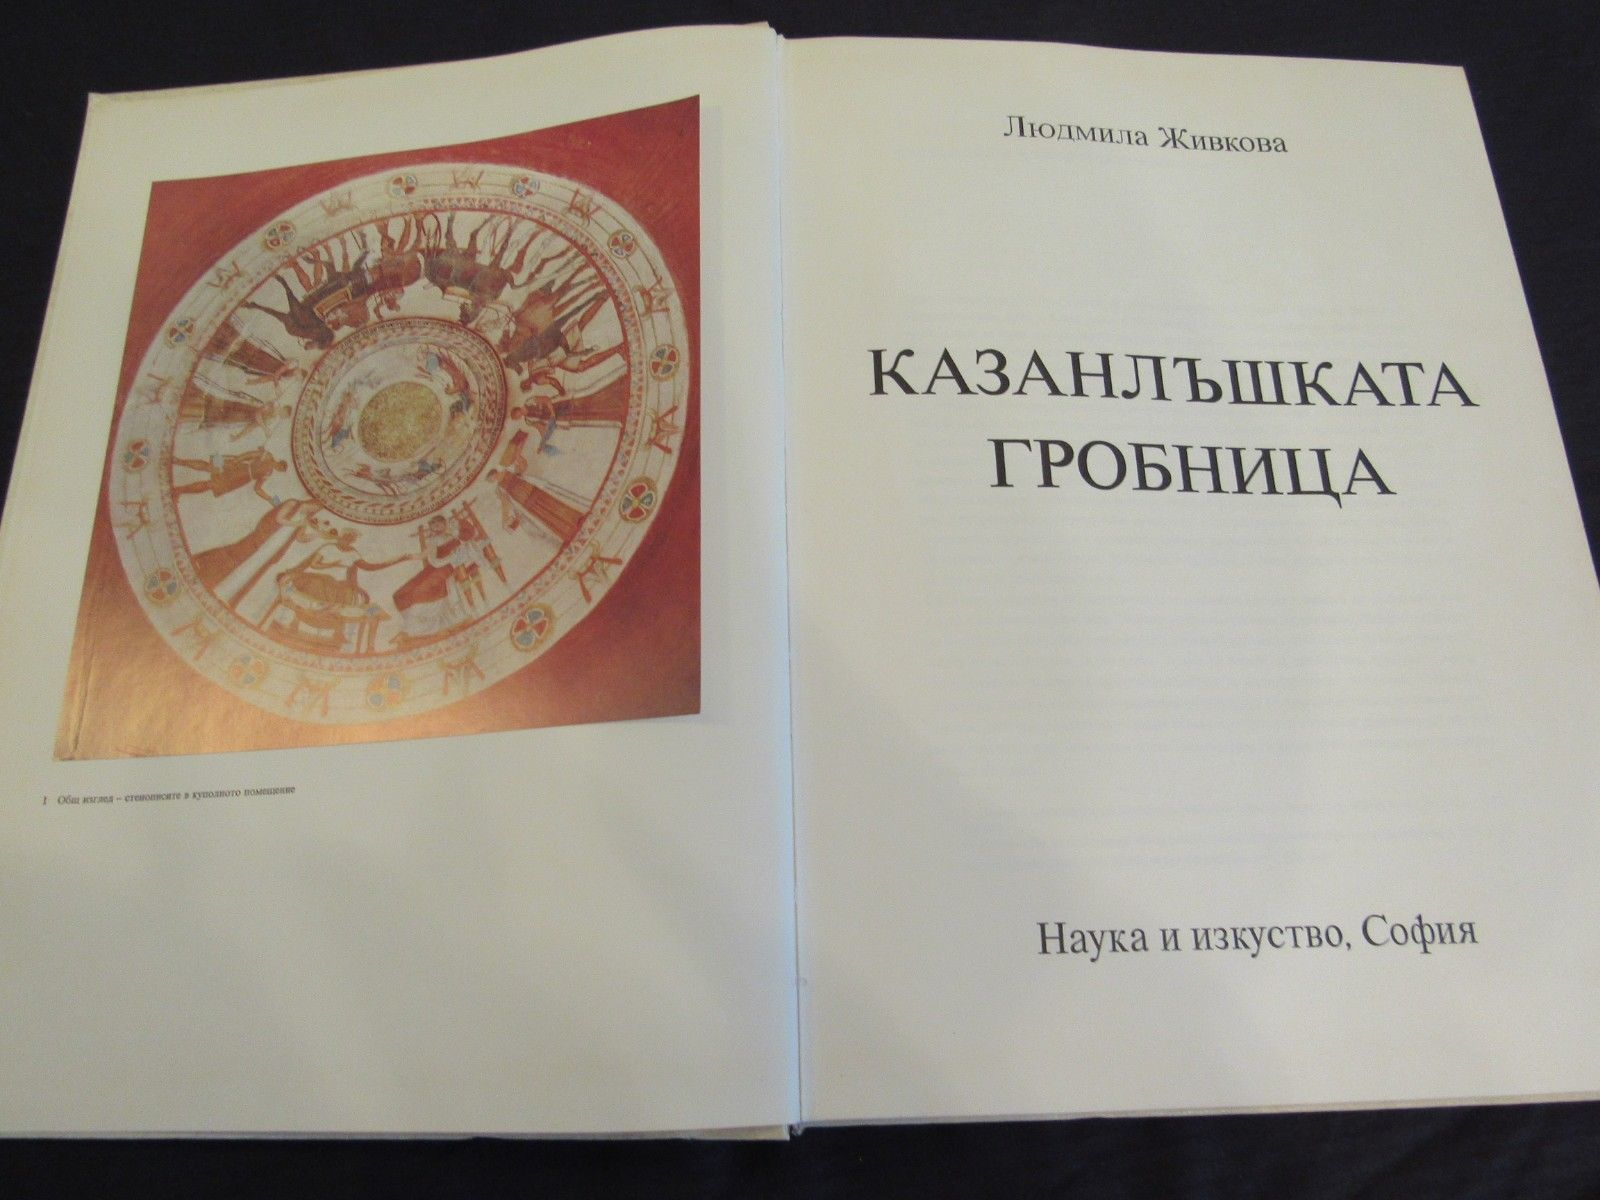 1960s Vtg Lyudmila Zhivkova Book Thracian Tomb In Kazanlak Written in Bulgarian